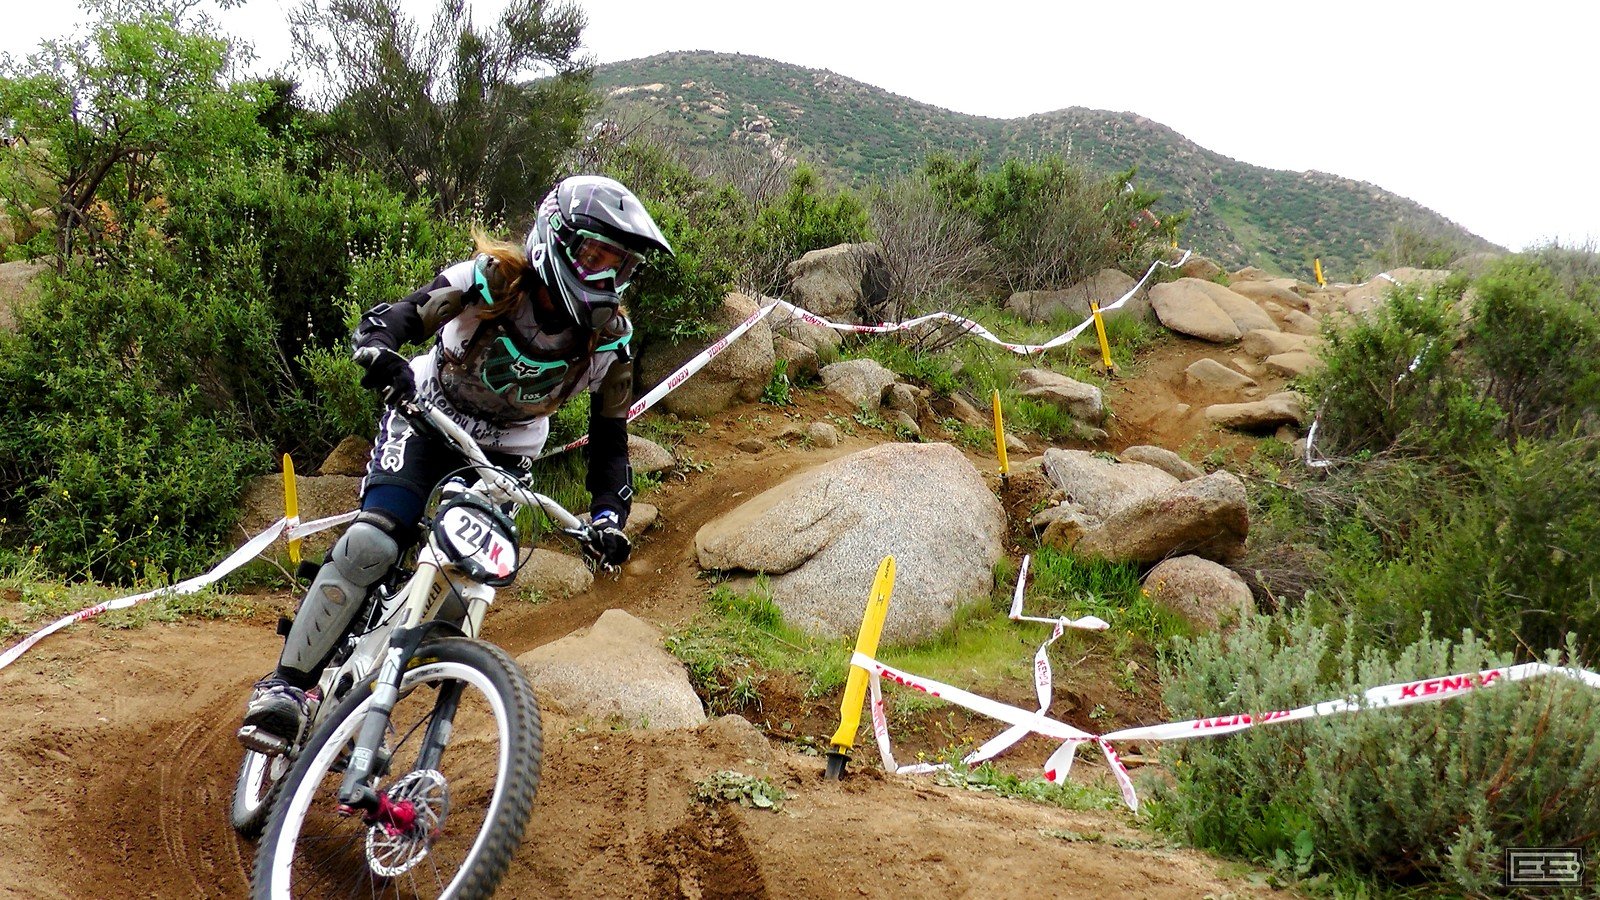 #224 K - EdwardsEntertainment - Mountain Biking Pictures - Vital MTB